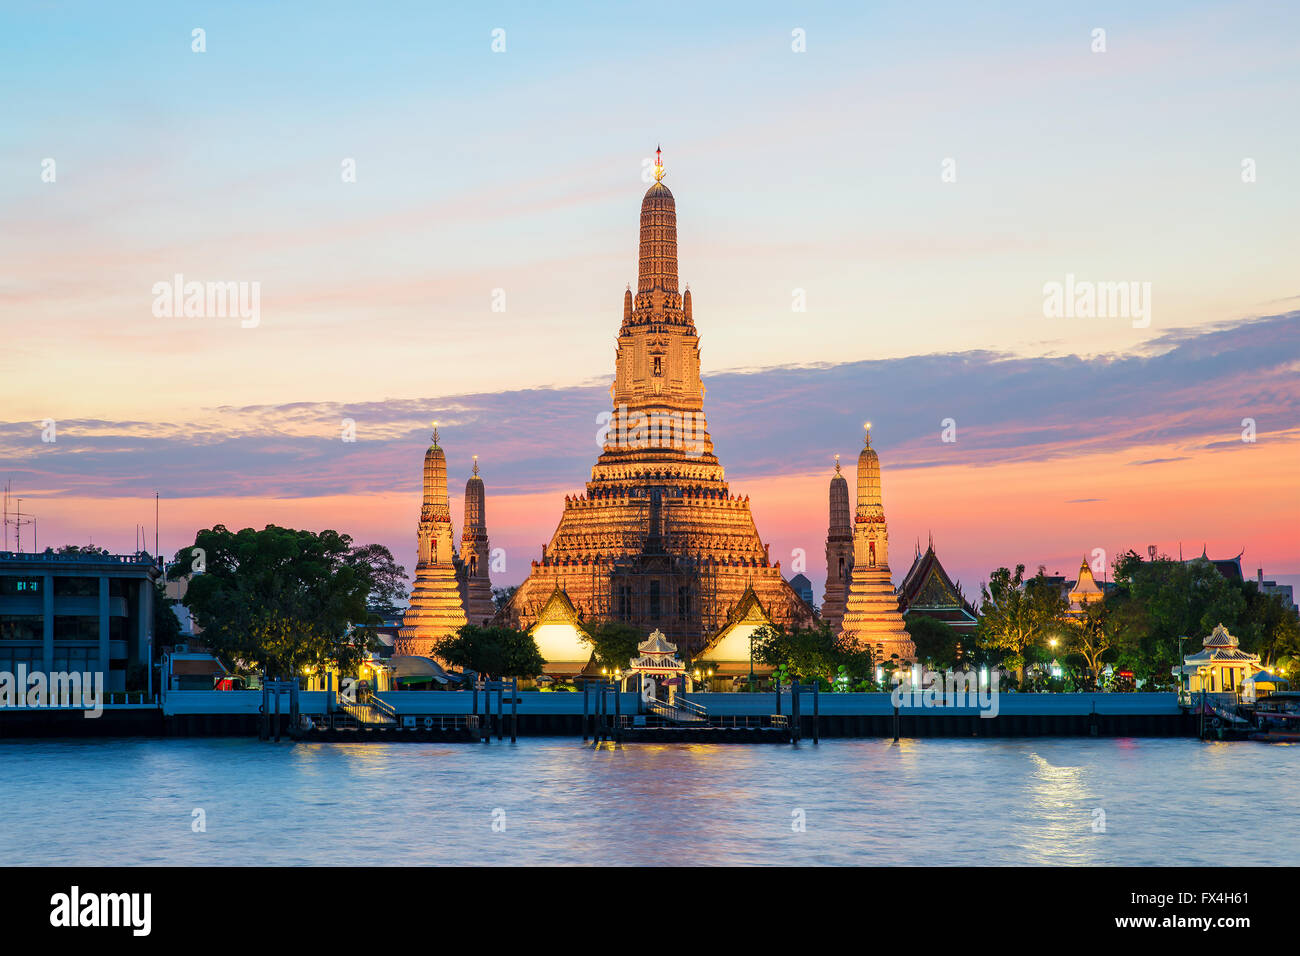 Wat Arun temple et la rivière Chao Phraya, Bangkok, Thaïlande Photo Stock